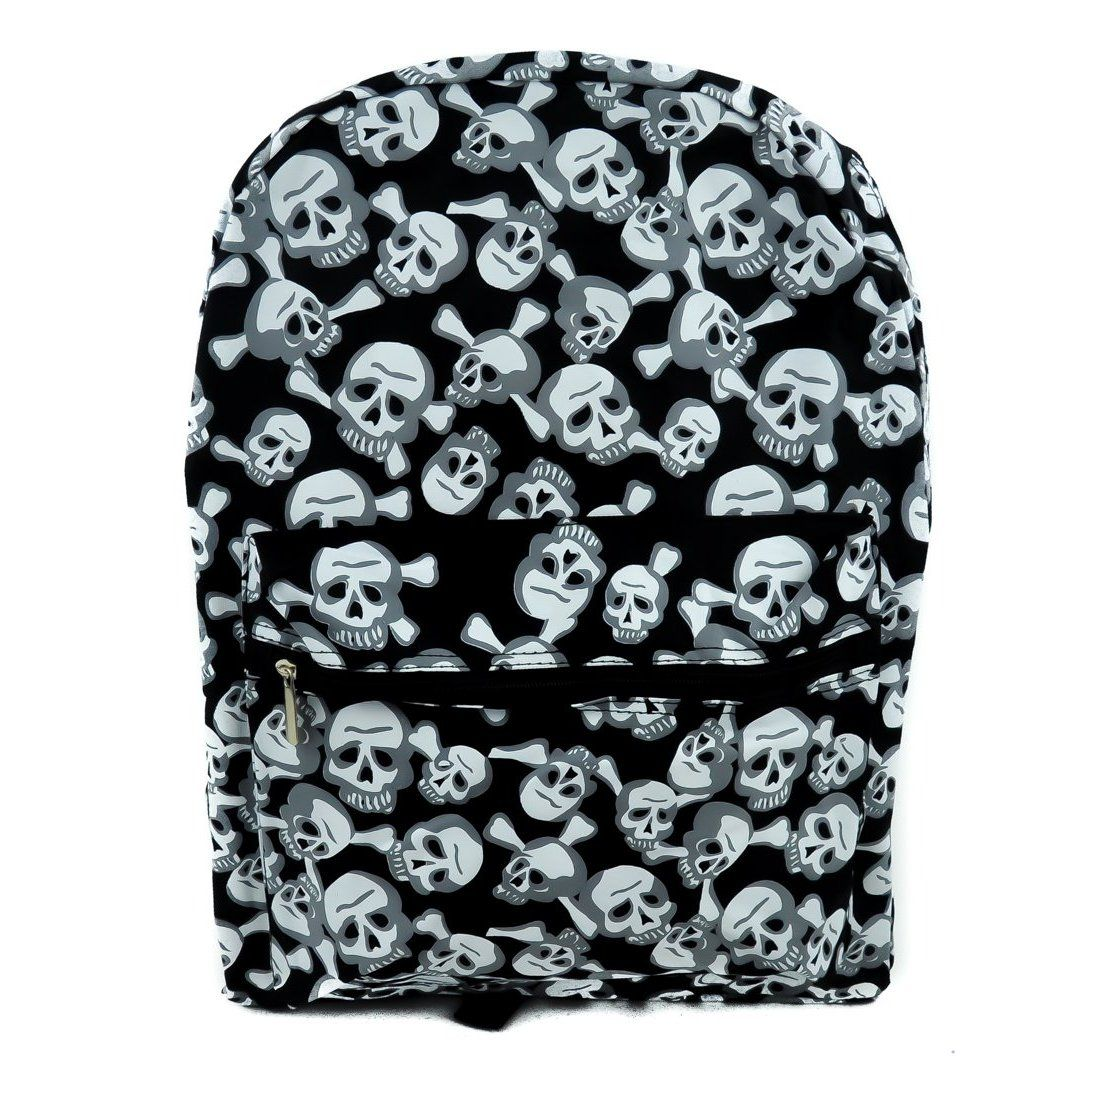 Dysfunctional Doll Black and White Skull w/ Cross Bones Backpack School Bag : Purses & Bags